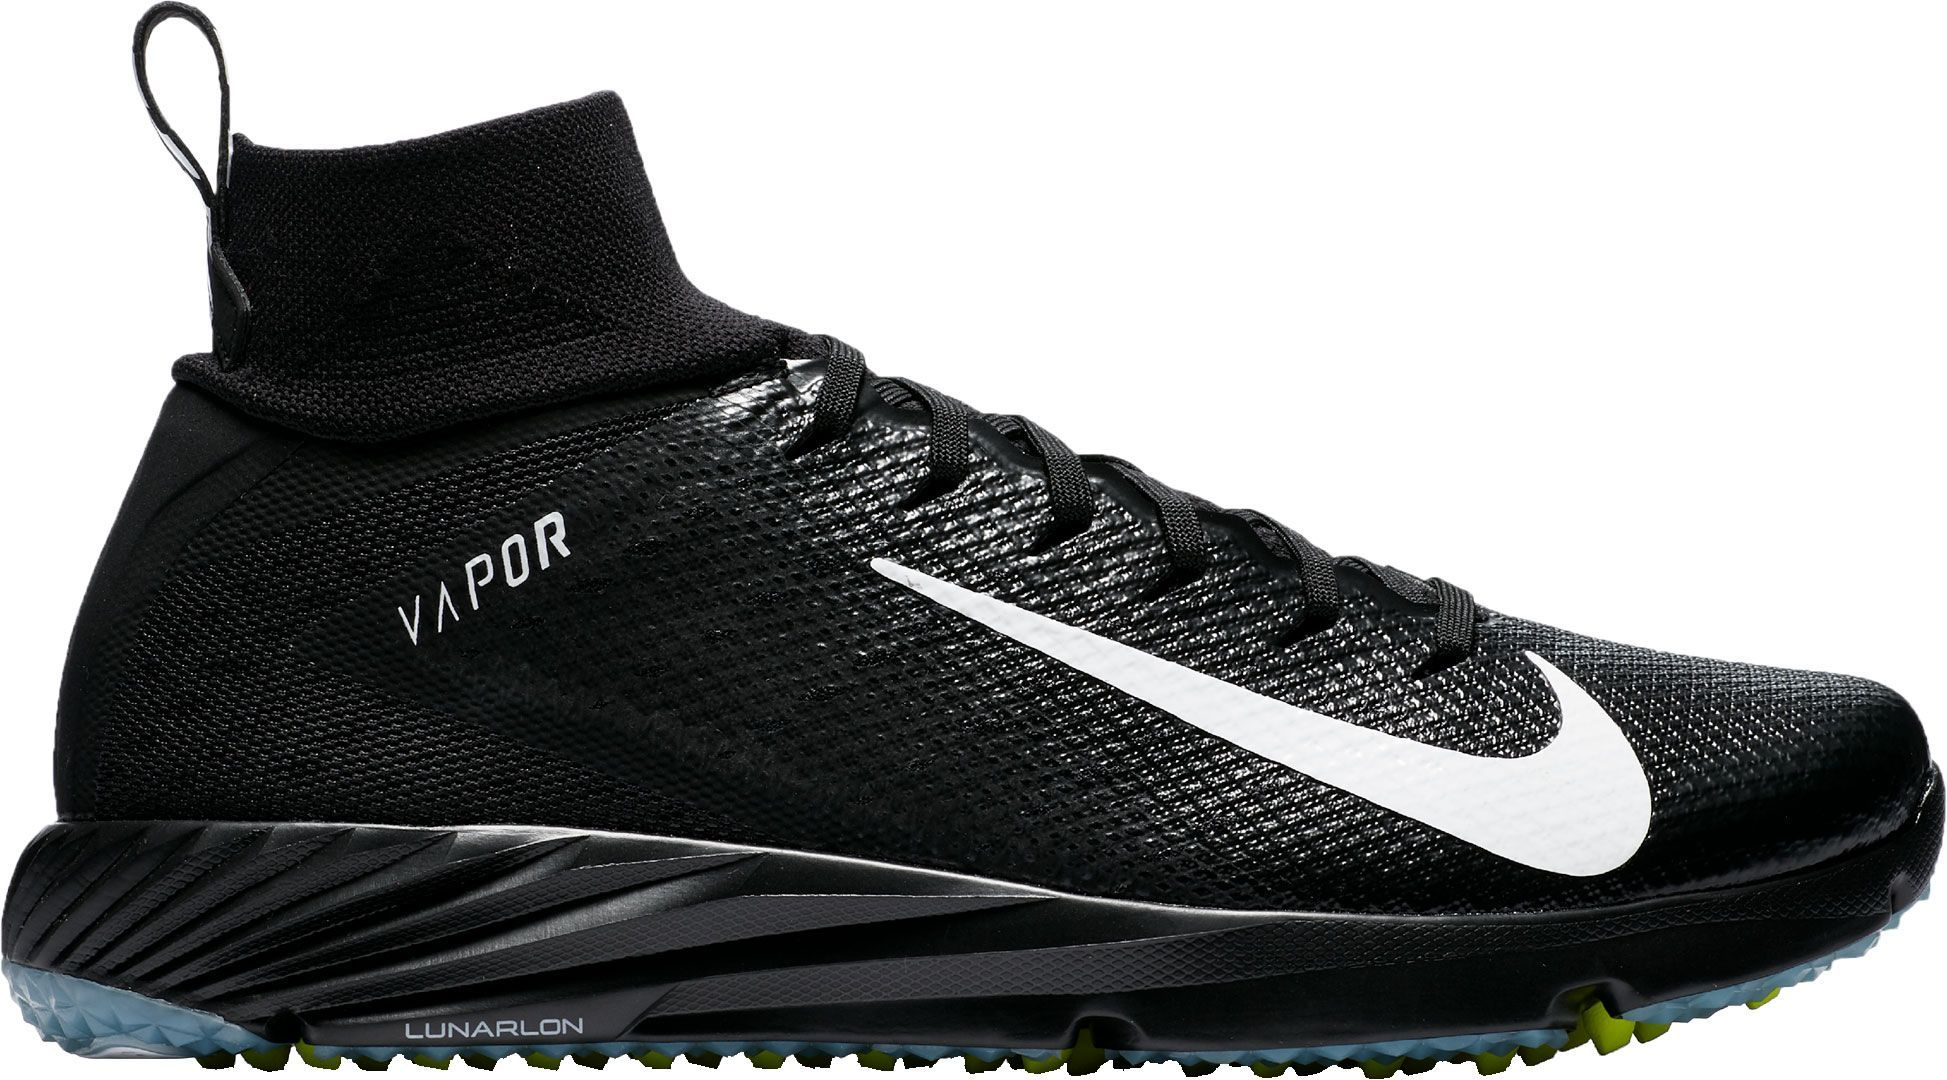 aaecf18111 Nike Men's Vapor Untouchable Speed Turf 2 Football Trainers, Size: 8.5,  Black